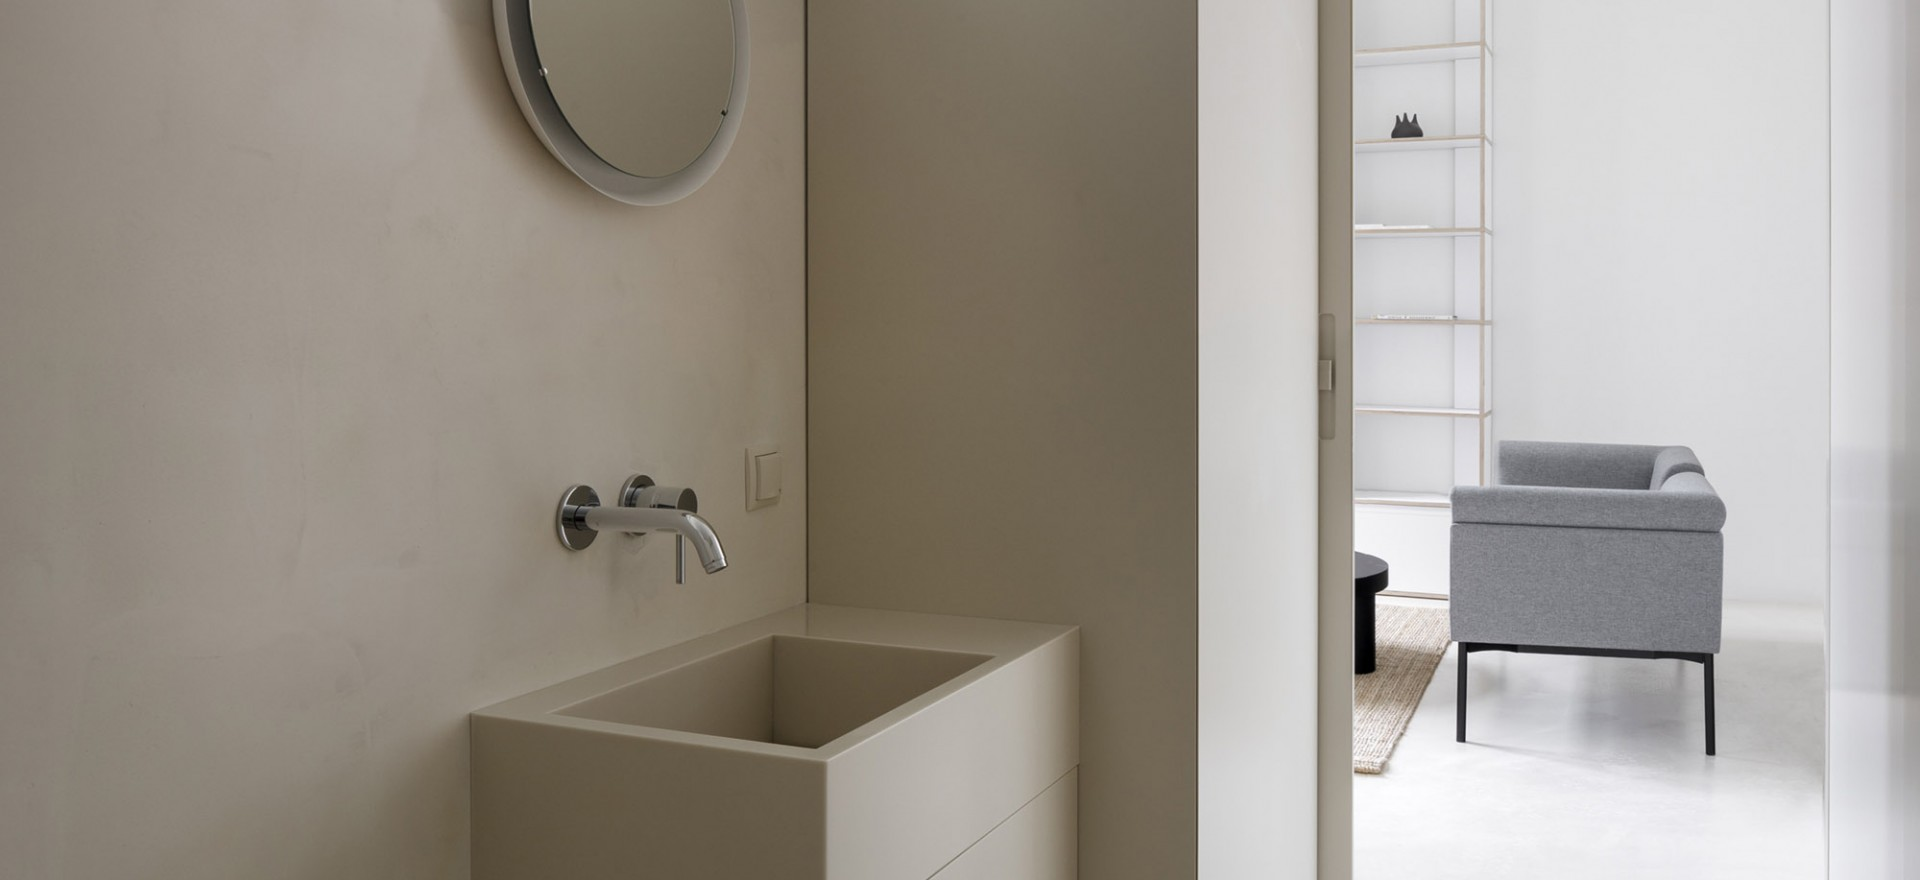 thisispaper_aplace_apartment_interior_design_warsaw_berlin_maja_wirkus_photography_2 copy 1